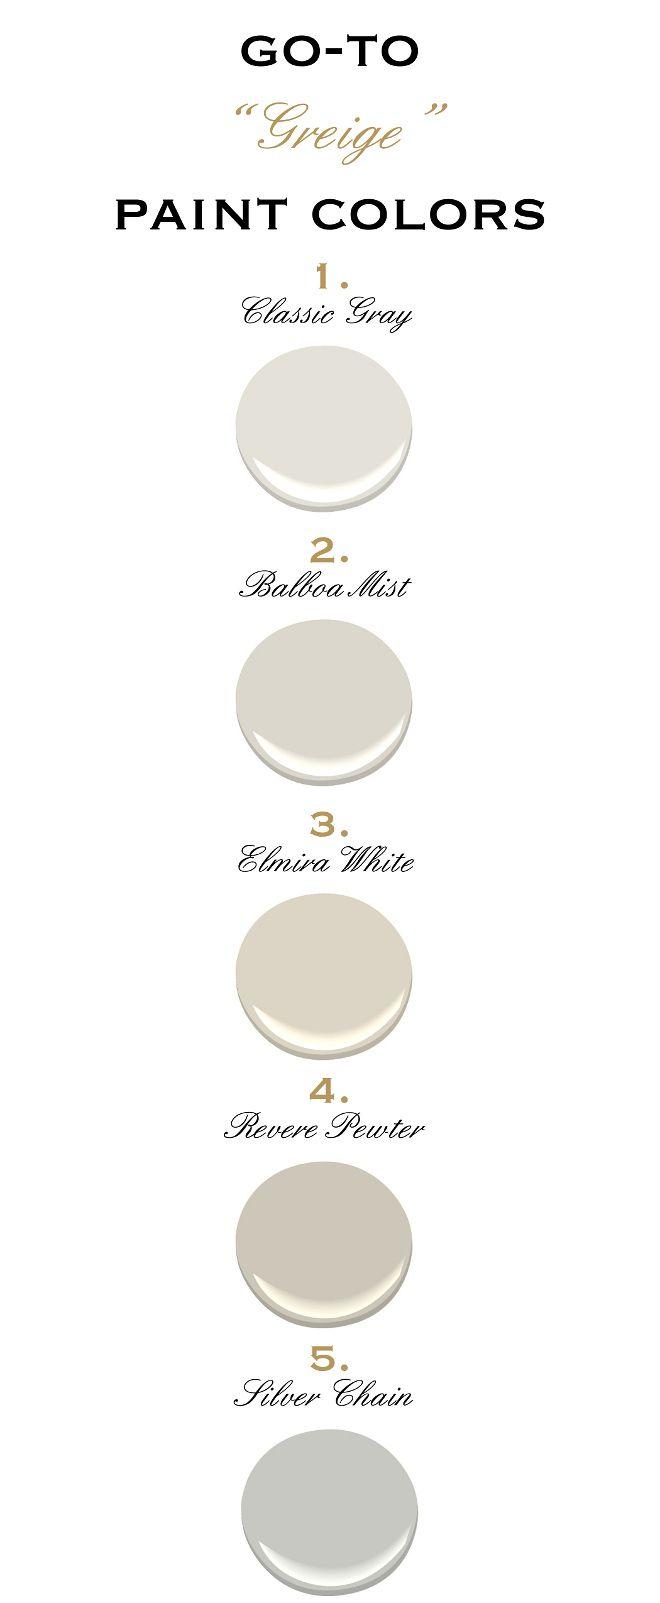 Top Greige Paint Colors by Benjamin Moore. Benjamin Moore Classic Gray. Benjamin Moore Balboa Mist. Benjamin Moore Elmira White. Benjamin Moore Revere Pewter. Benjamin Moore Silver Chain.